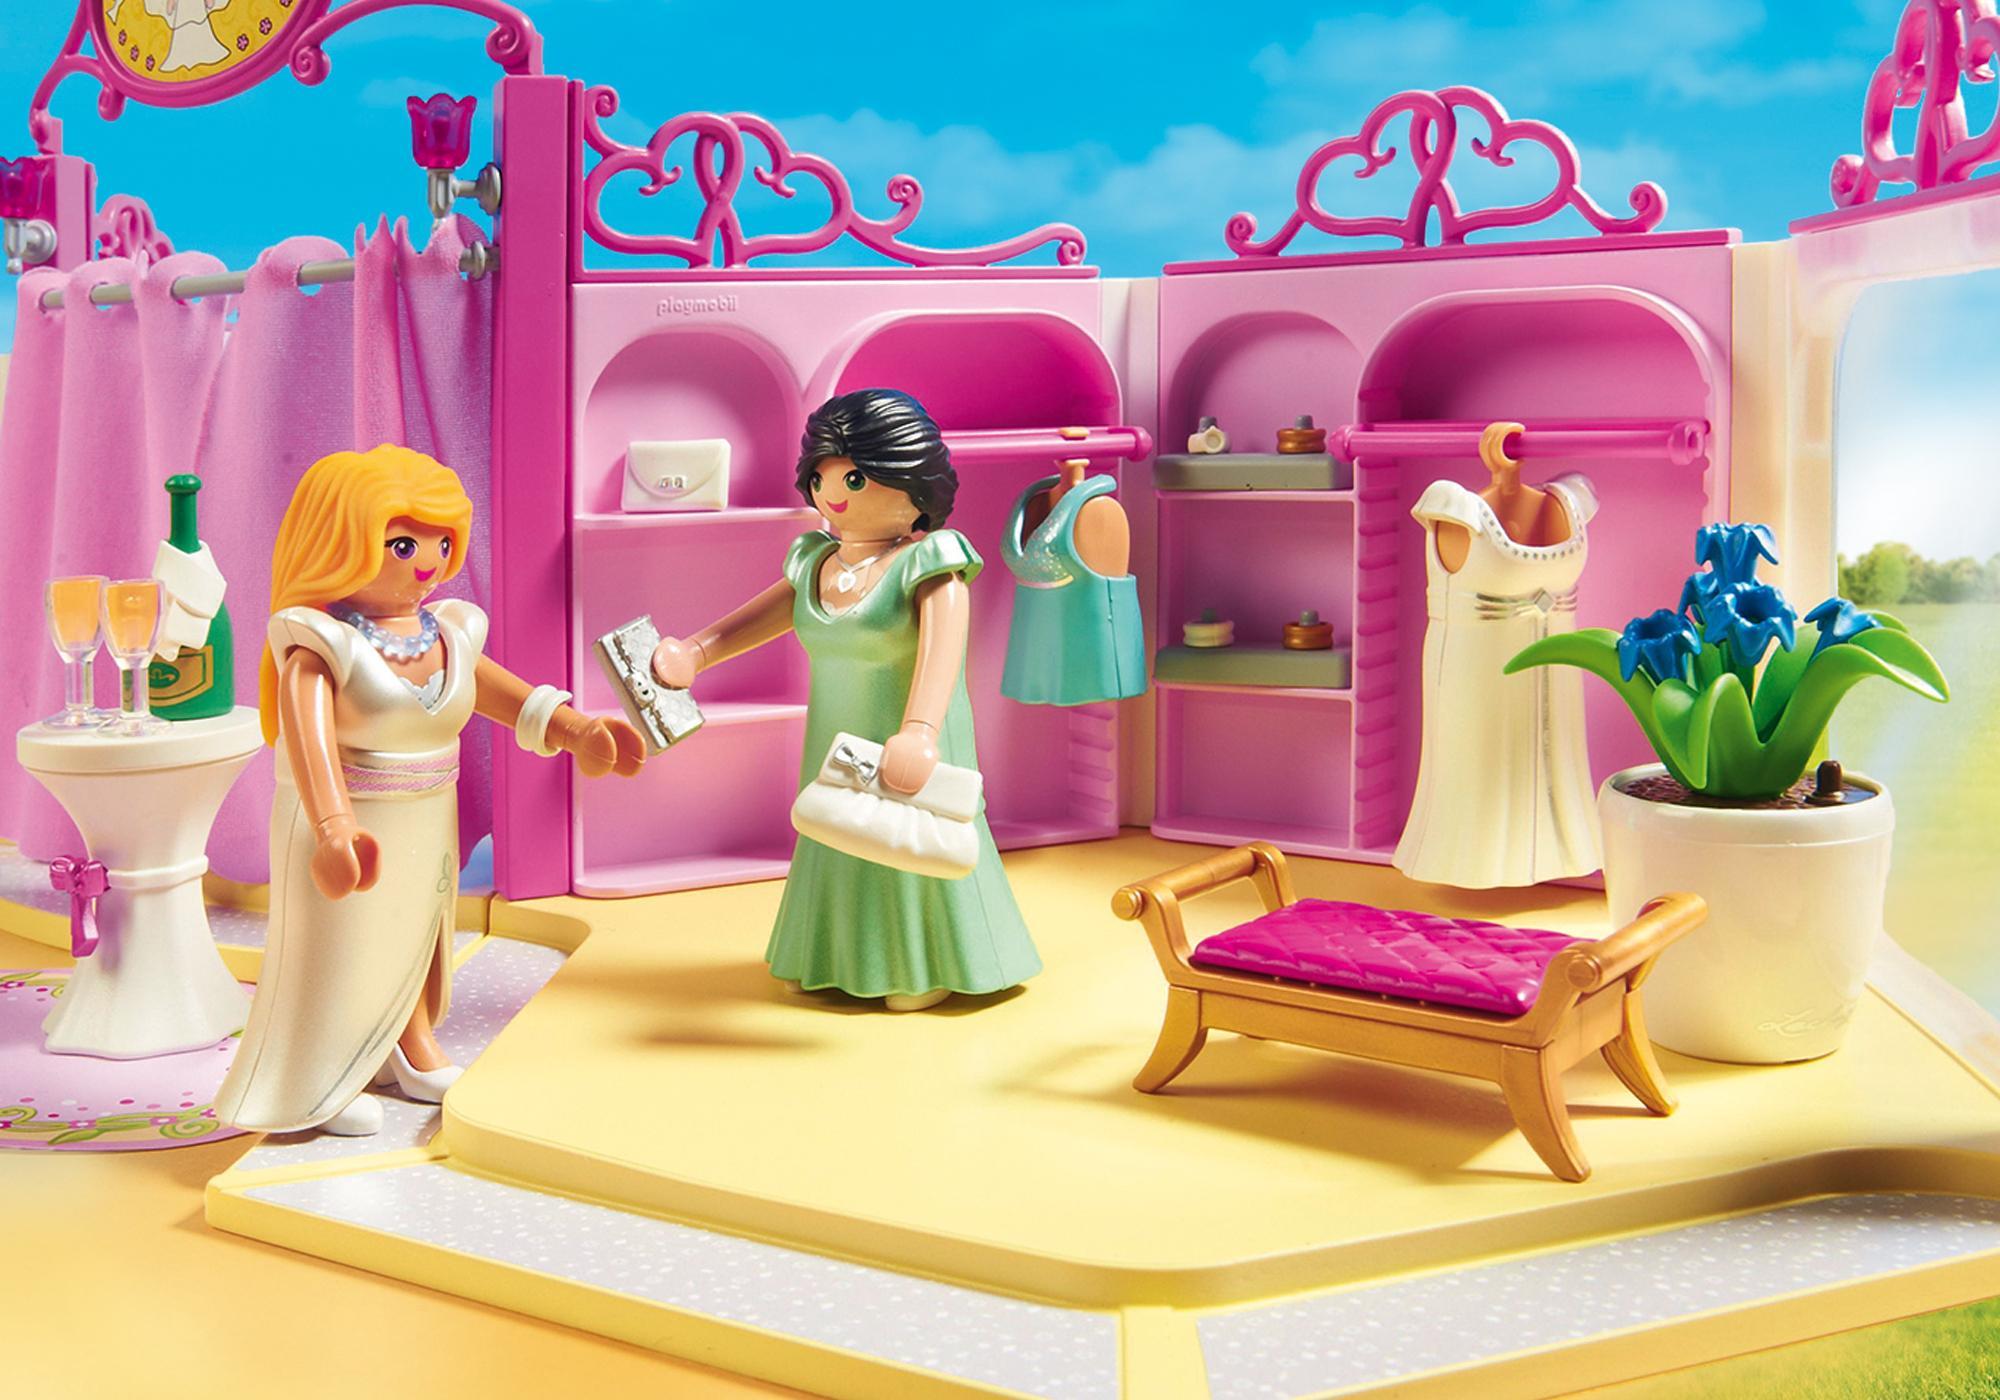 http://media.playmobil.com/i/playmobil/9226_product_extra3/Κατάστημα νυφικών με σαλόνι ομορφιάς